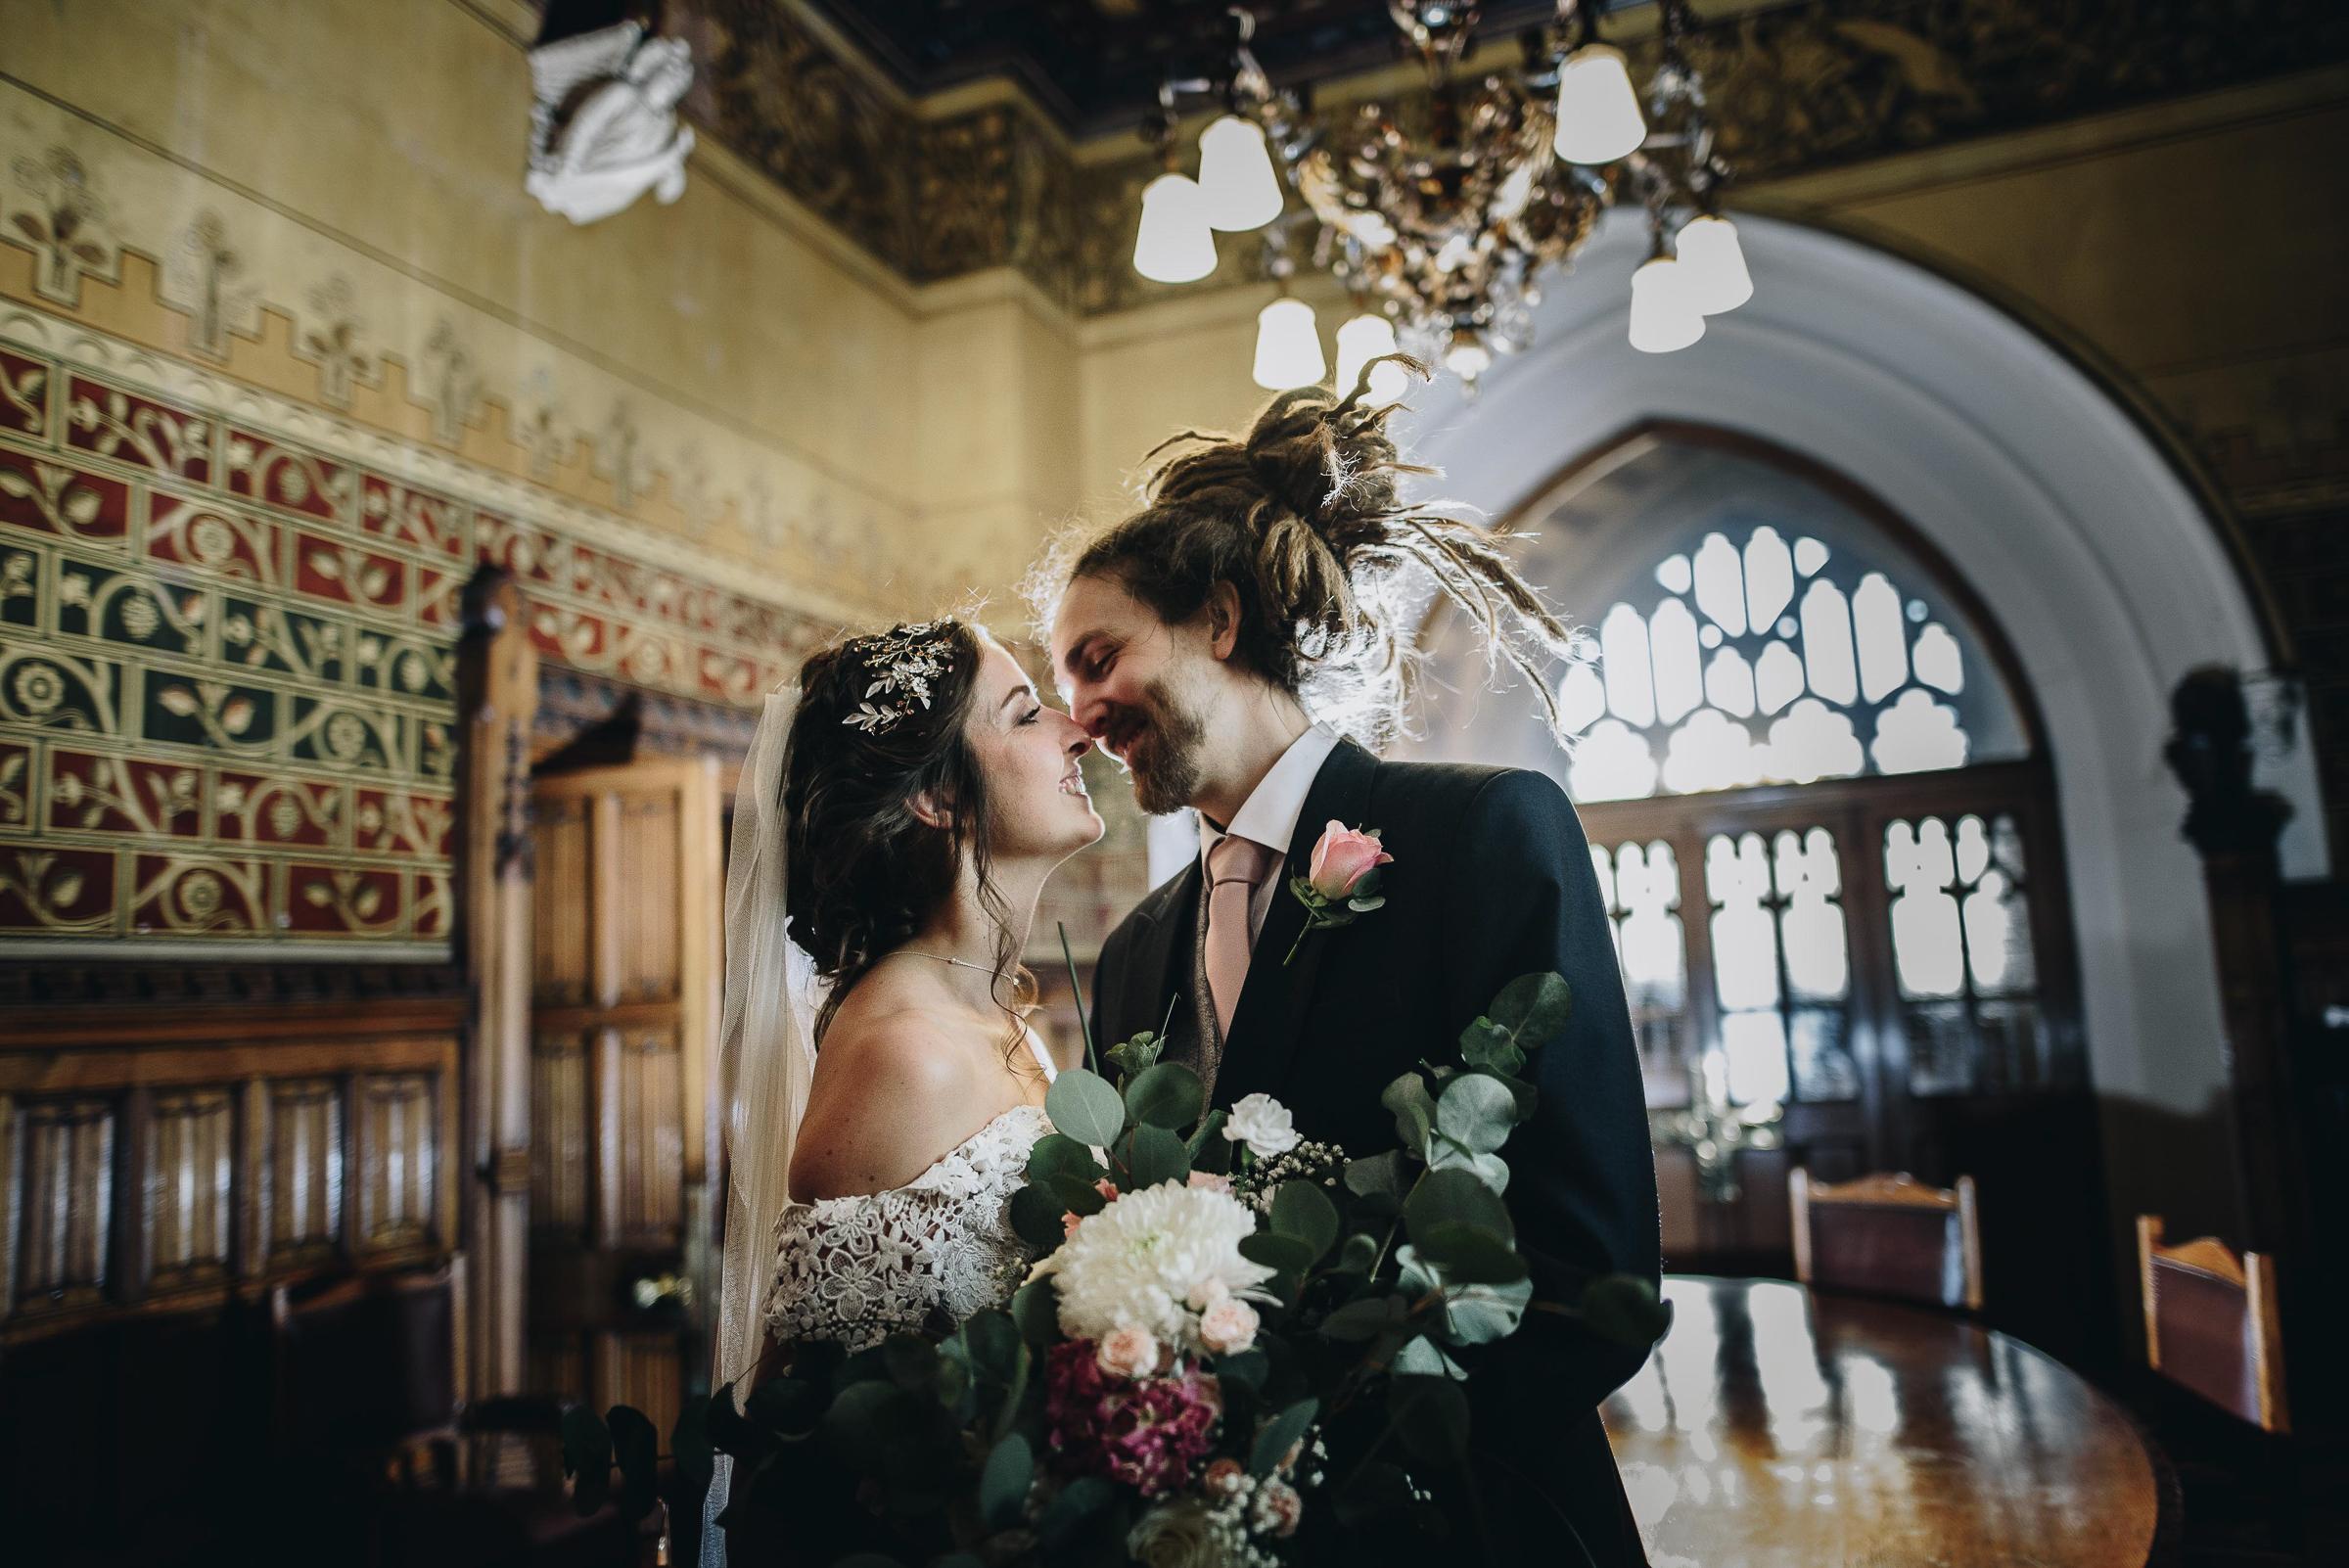 Rochdale-town-hall-vegan-harry-potter-wedding-photography-31.jpg